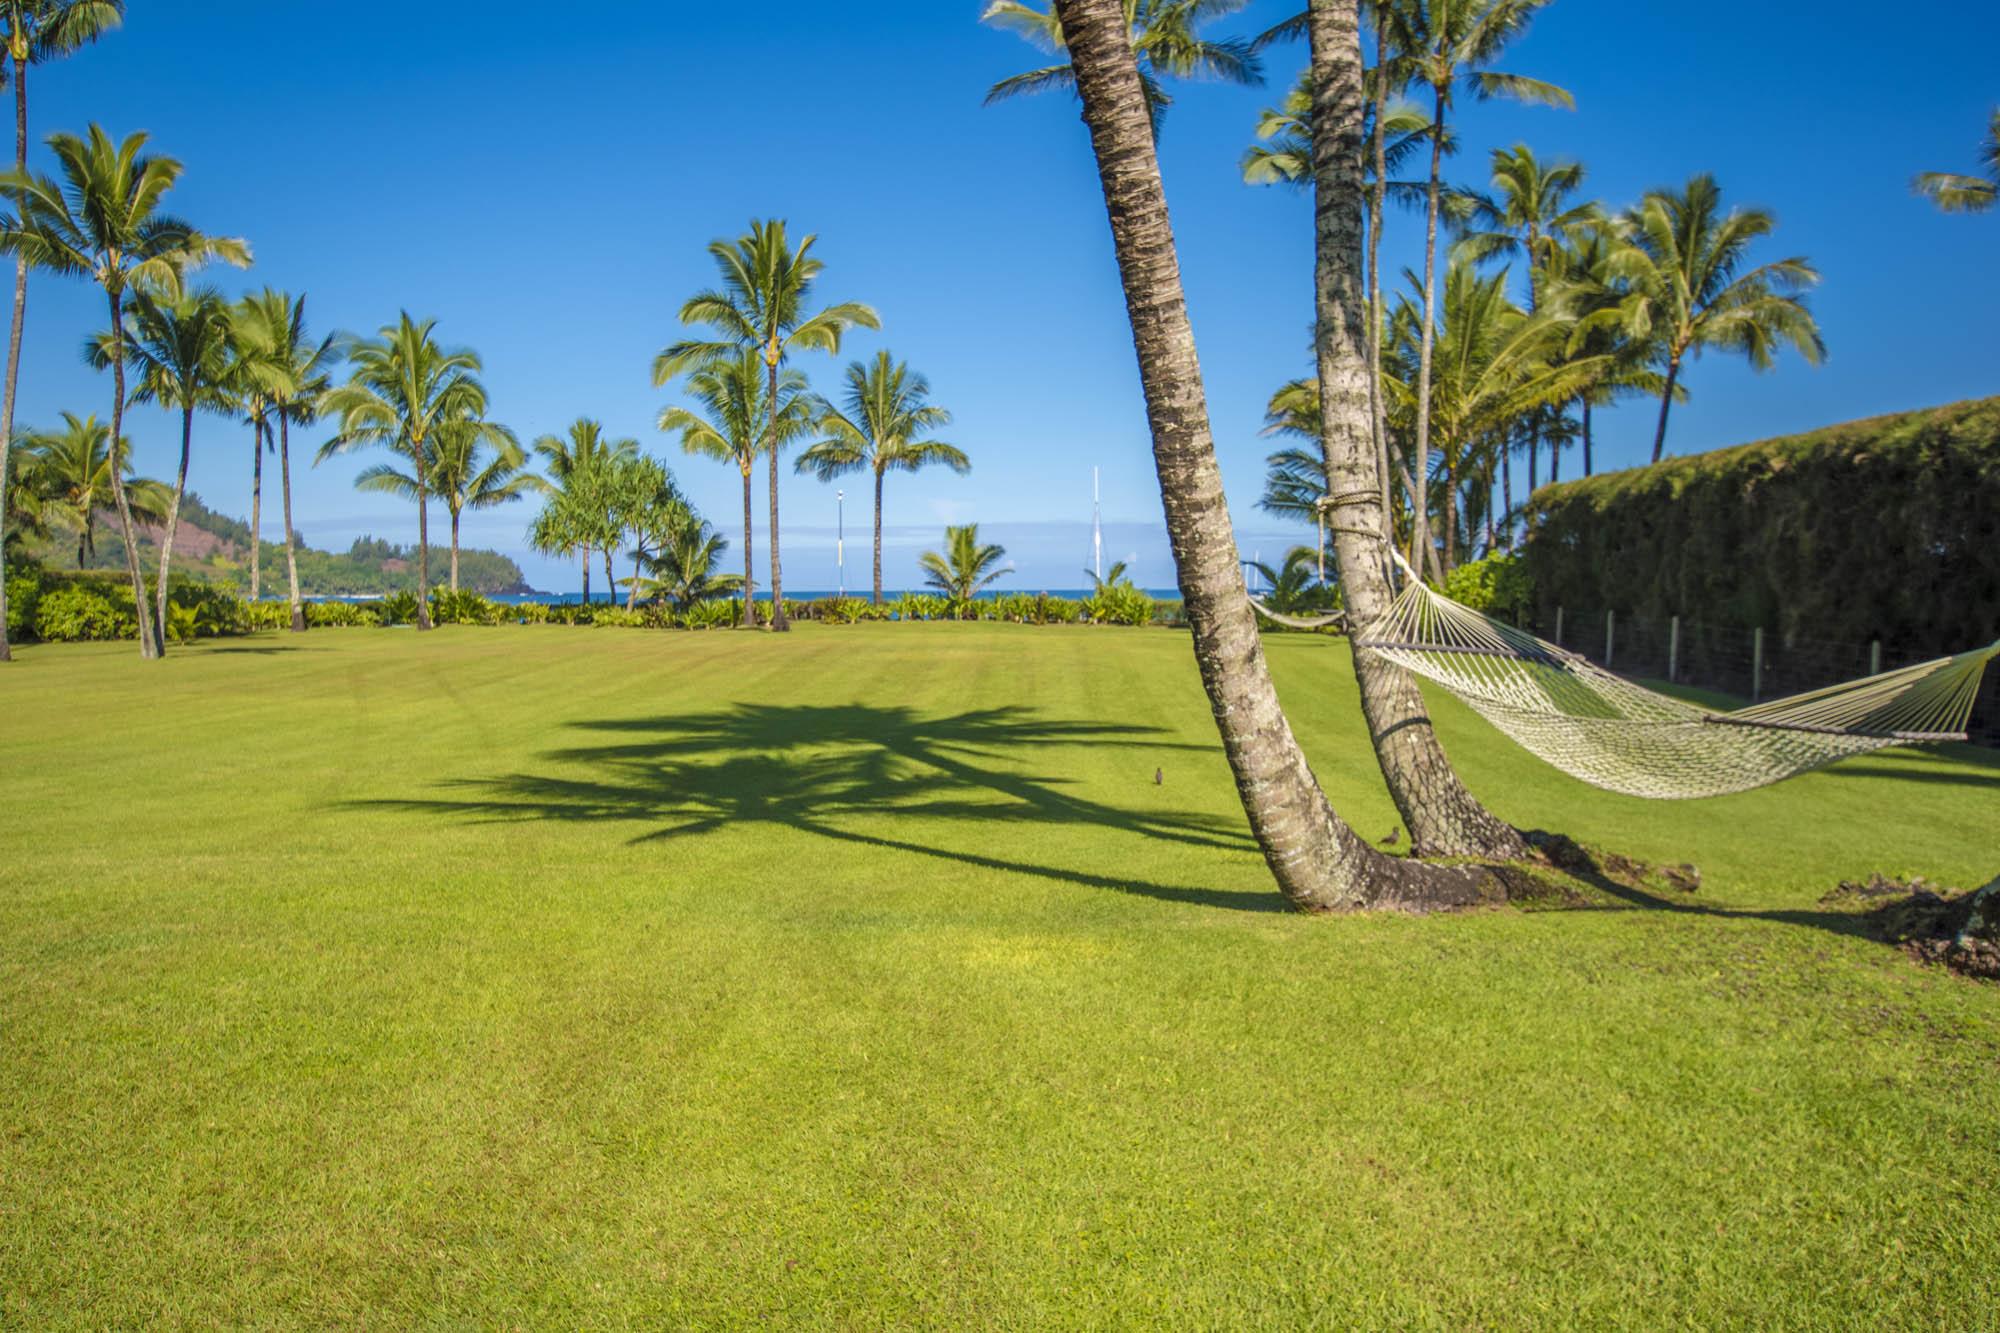 Kauai-217-Hanalei Bay3